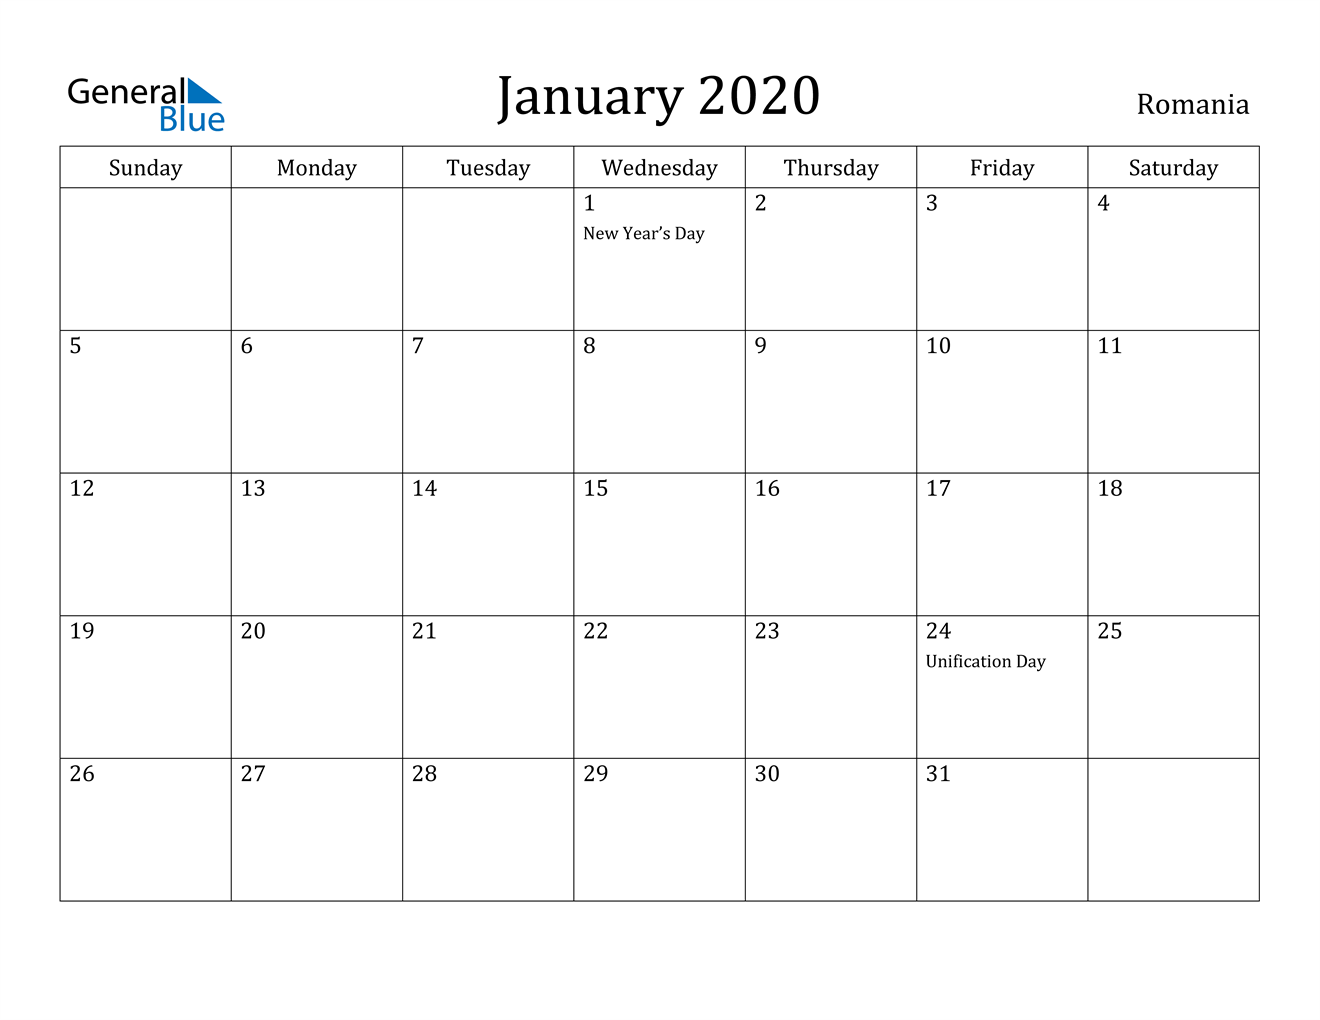 Image of January 2020 Romania Calendar with Holidays Calendar